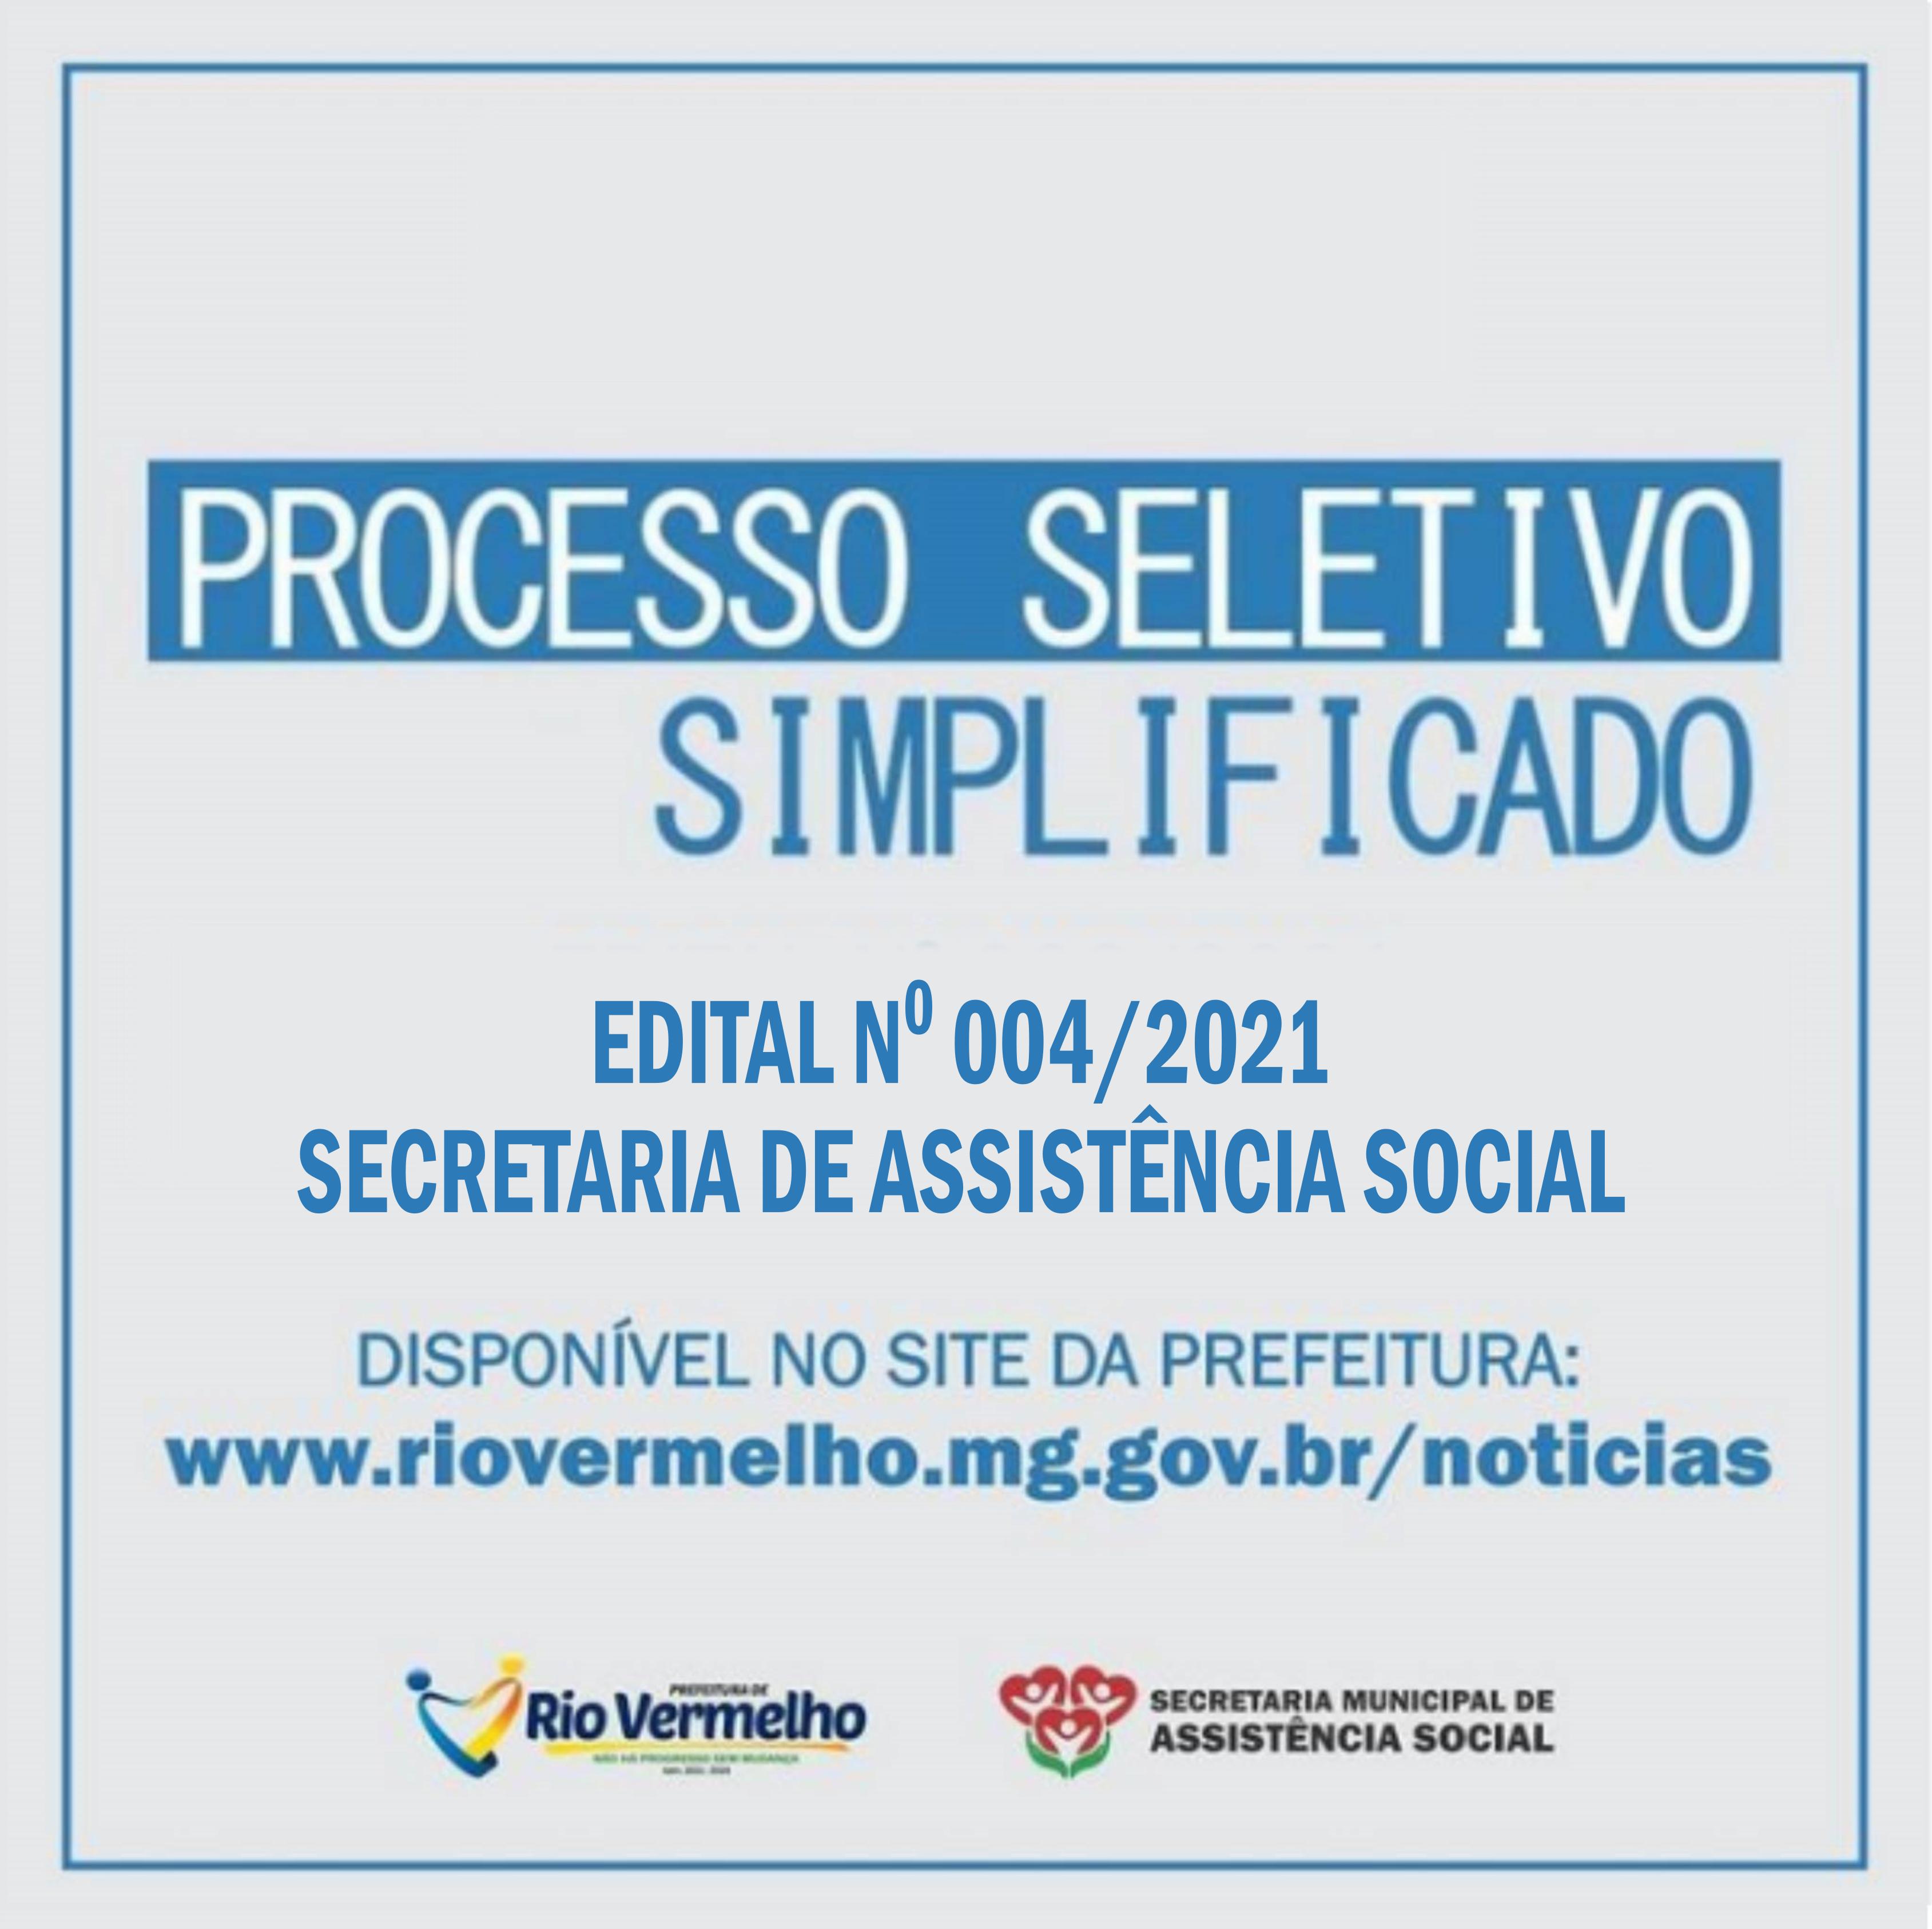 EDITAL DE PROCESSO SELETIVO SIMPLIFICADO Nº 004/2021 – SECRETARIA DE ASSISTÊNCIA SOCIAL